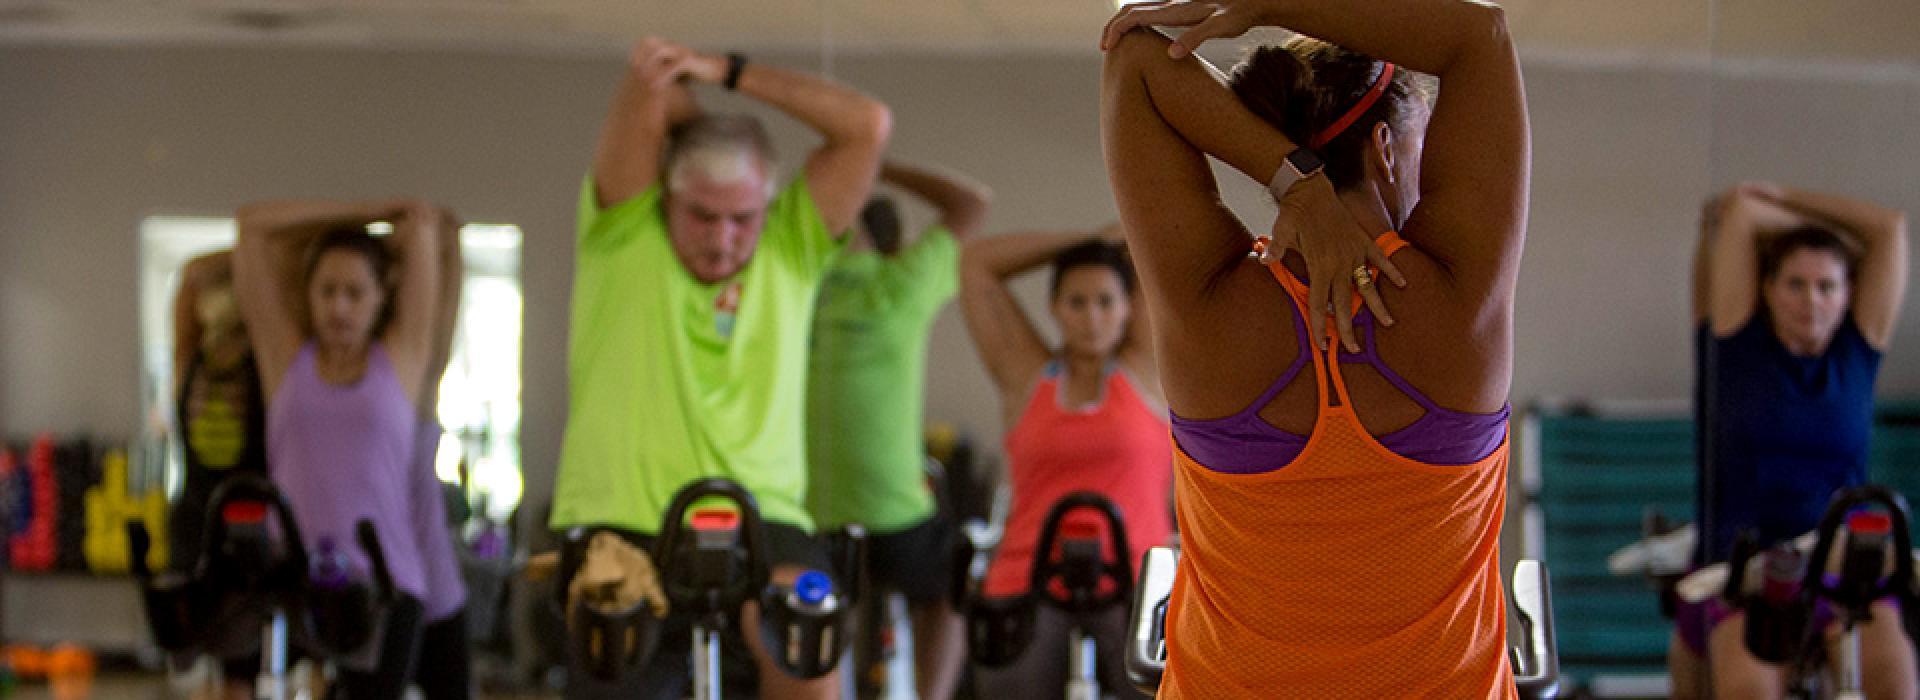 North Pinellas YMCA | YMCA of the Suncoast